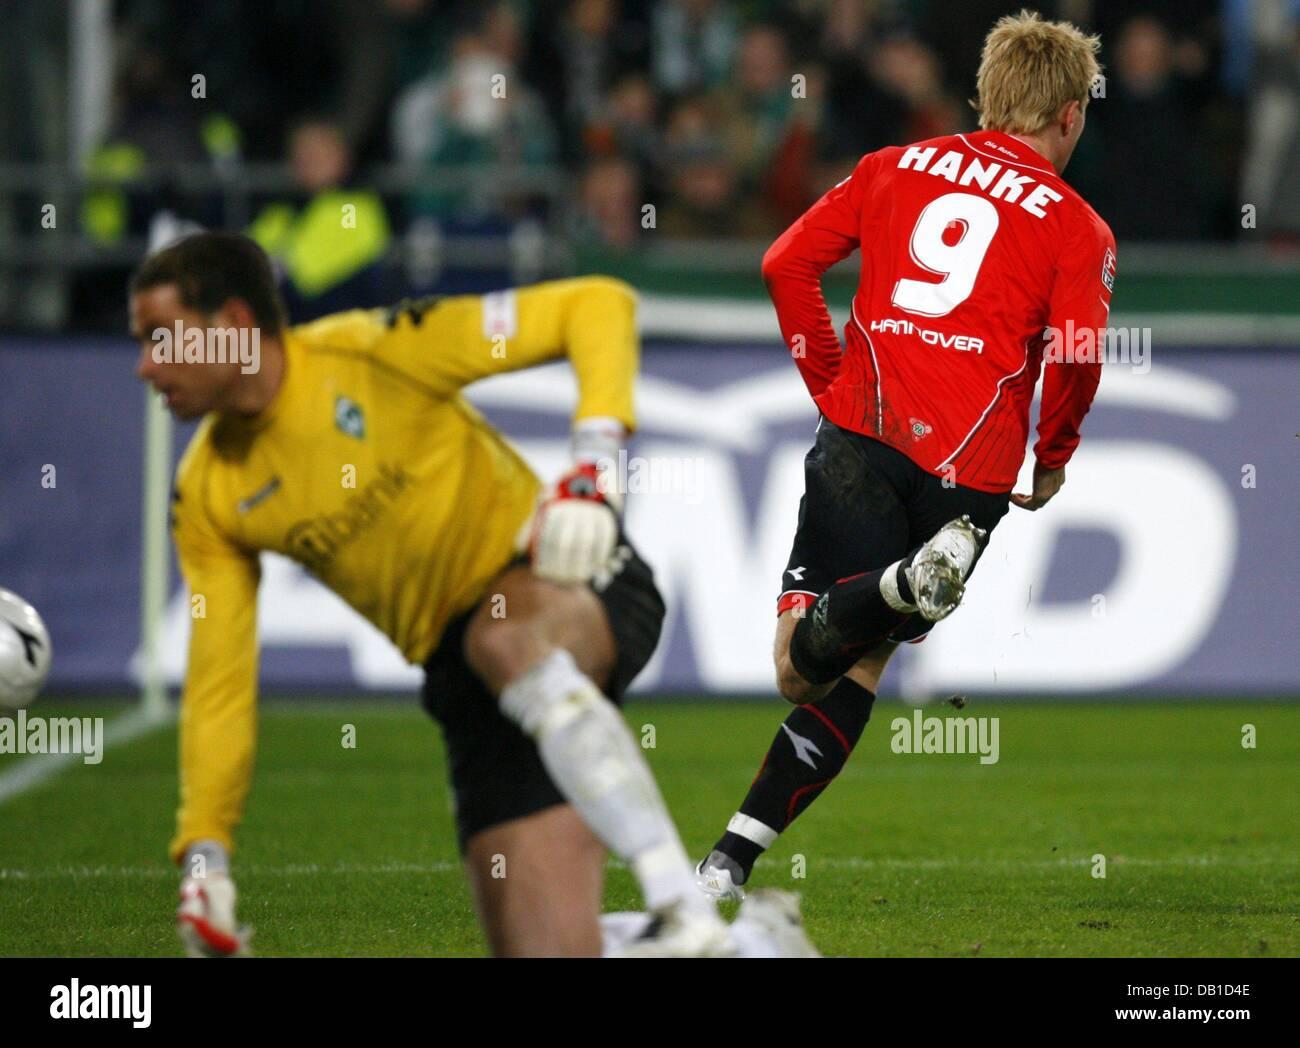 Mike Hanke of Hanover (R) scores the 4-3 against goalkeeper Tim Wiese of Bremen during the Bundesliga match Hanover Stock Photo